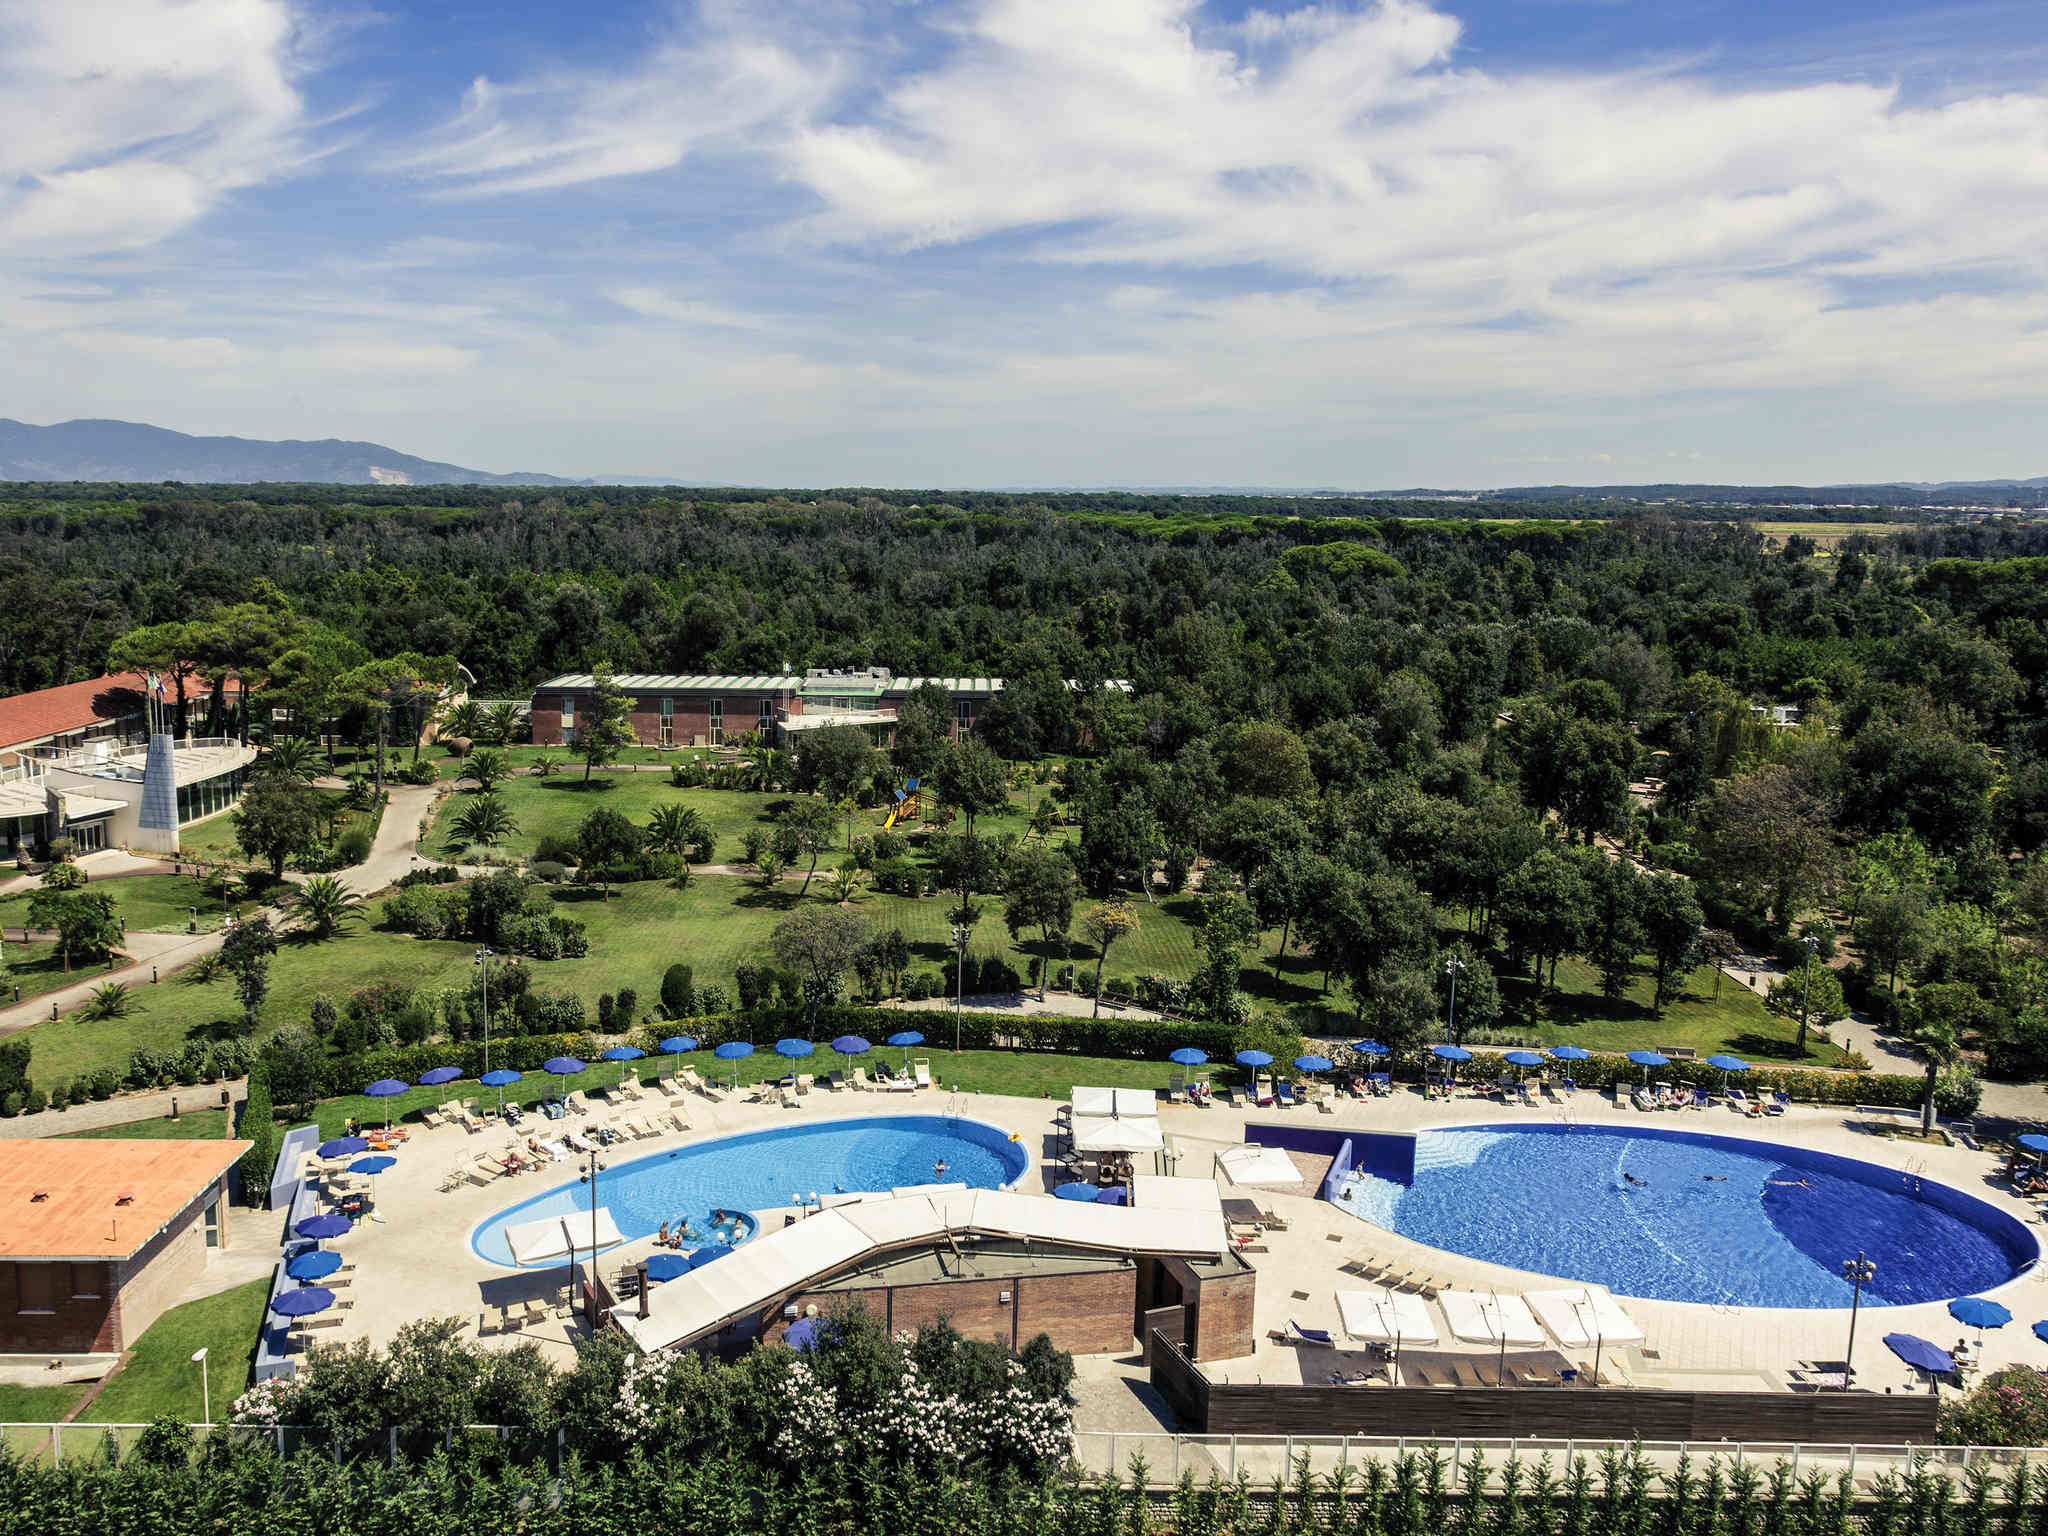 Hotell – Hotel Mercure Tirrenia Green Park - New Opening